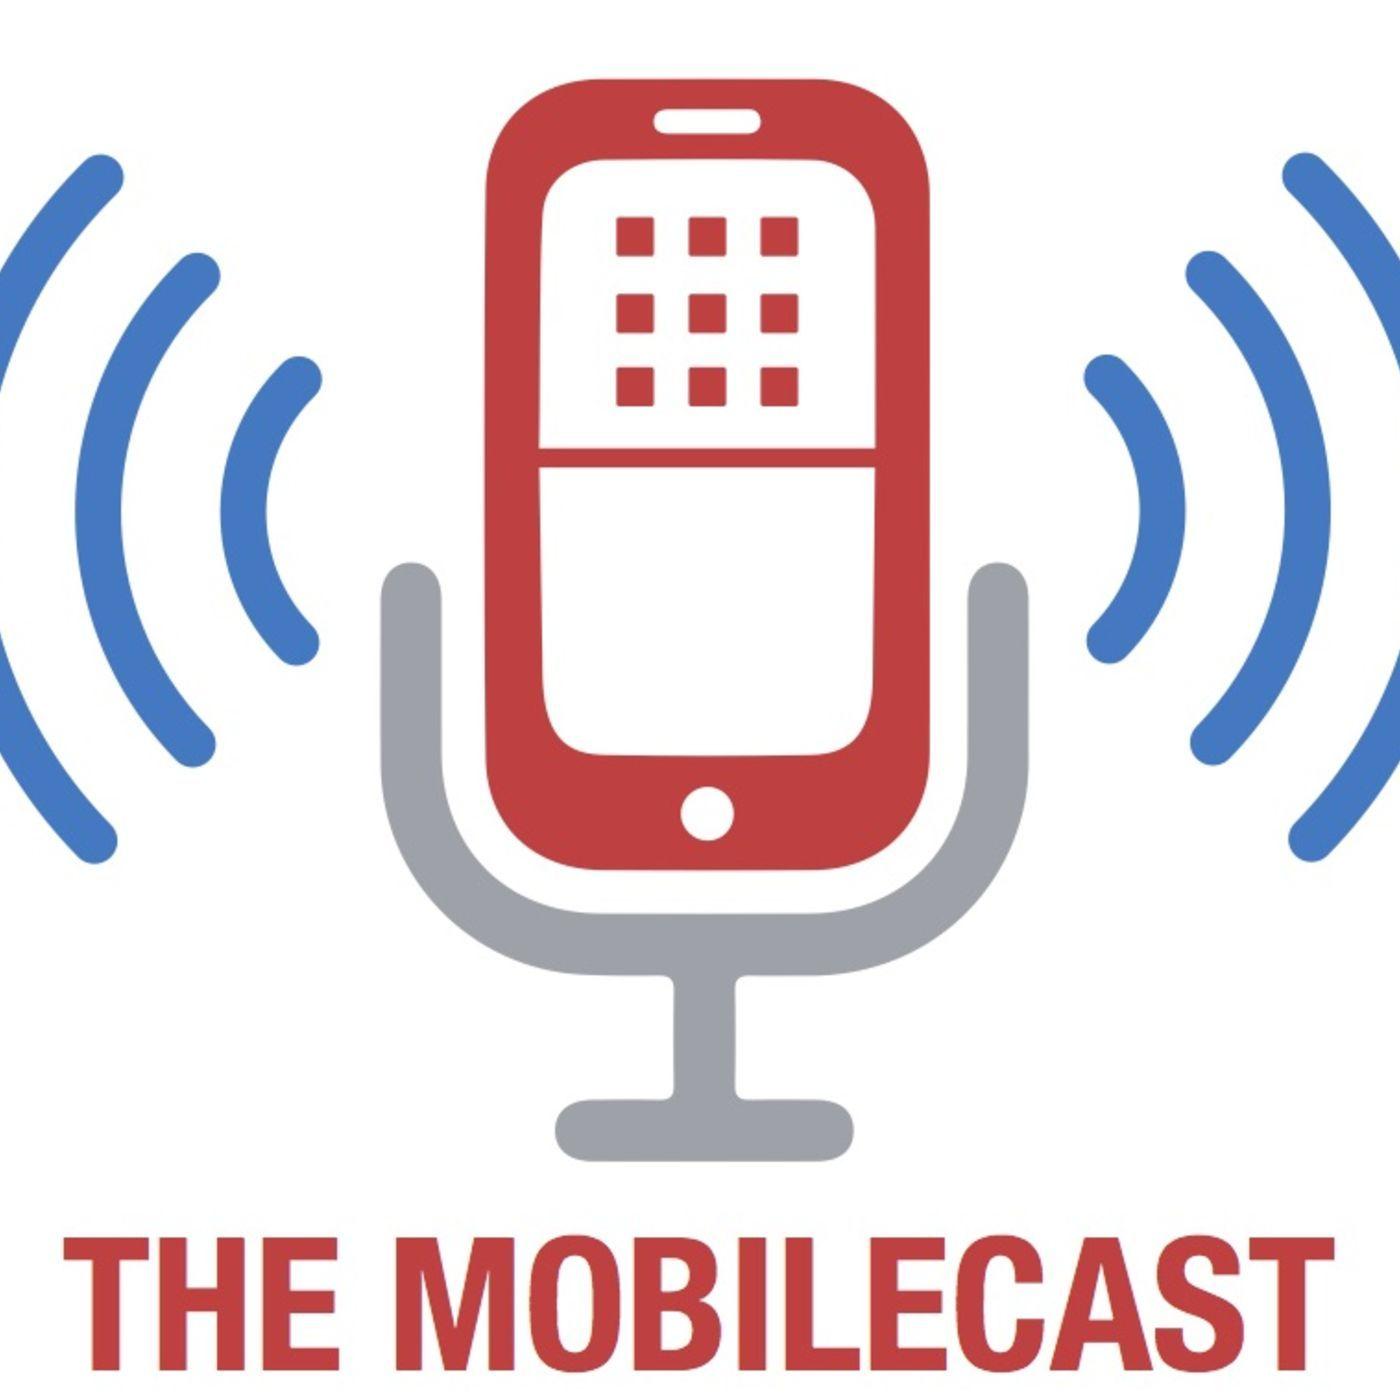 The Mobilecast #307 – S3 Ep07 Rob Tiffany, Mobile, IoT and Microsoft